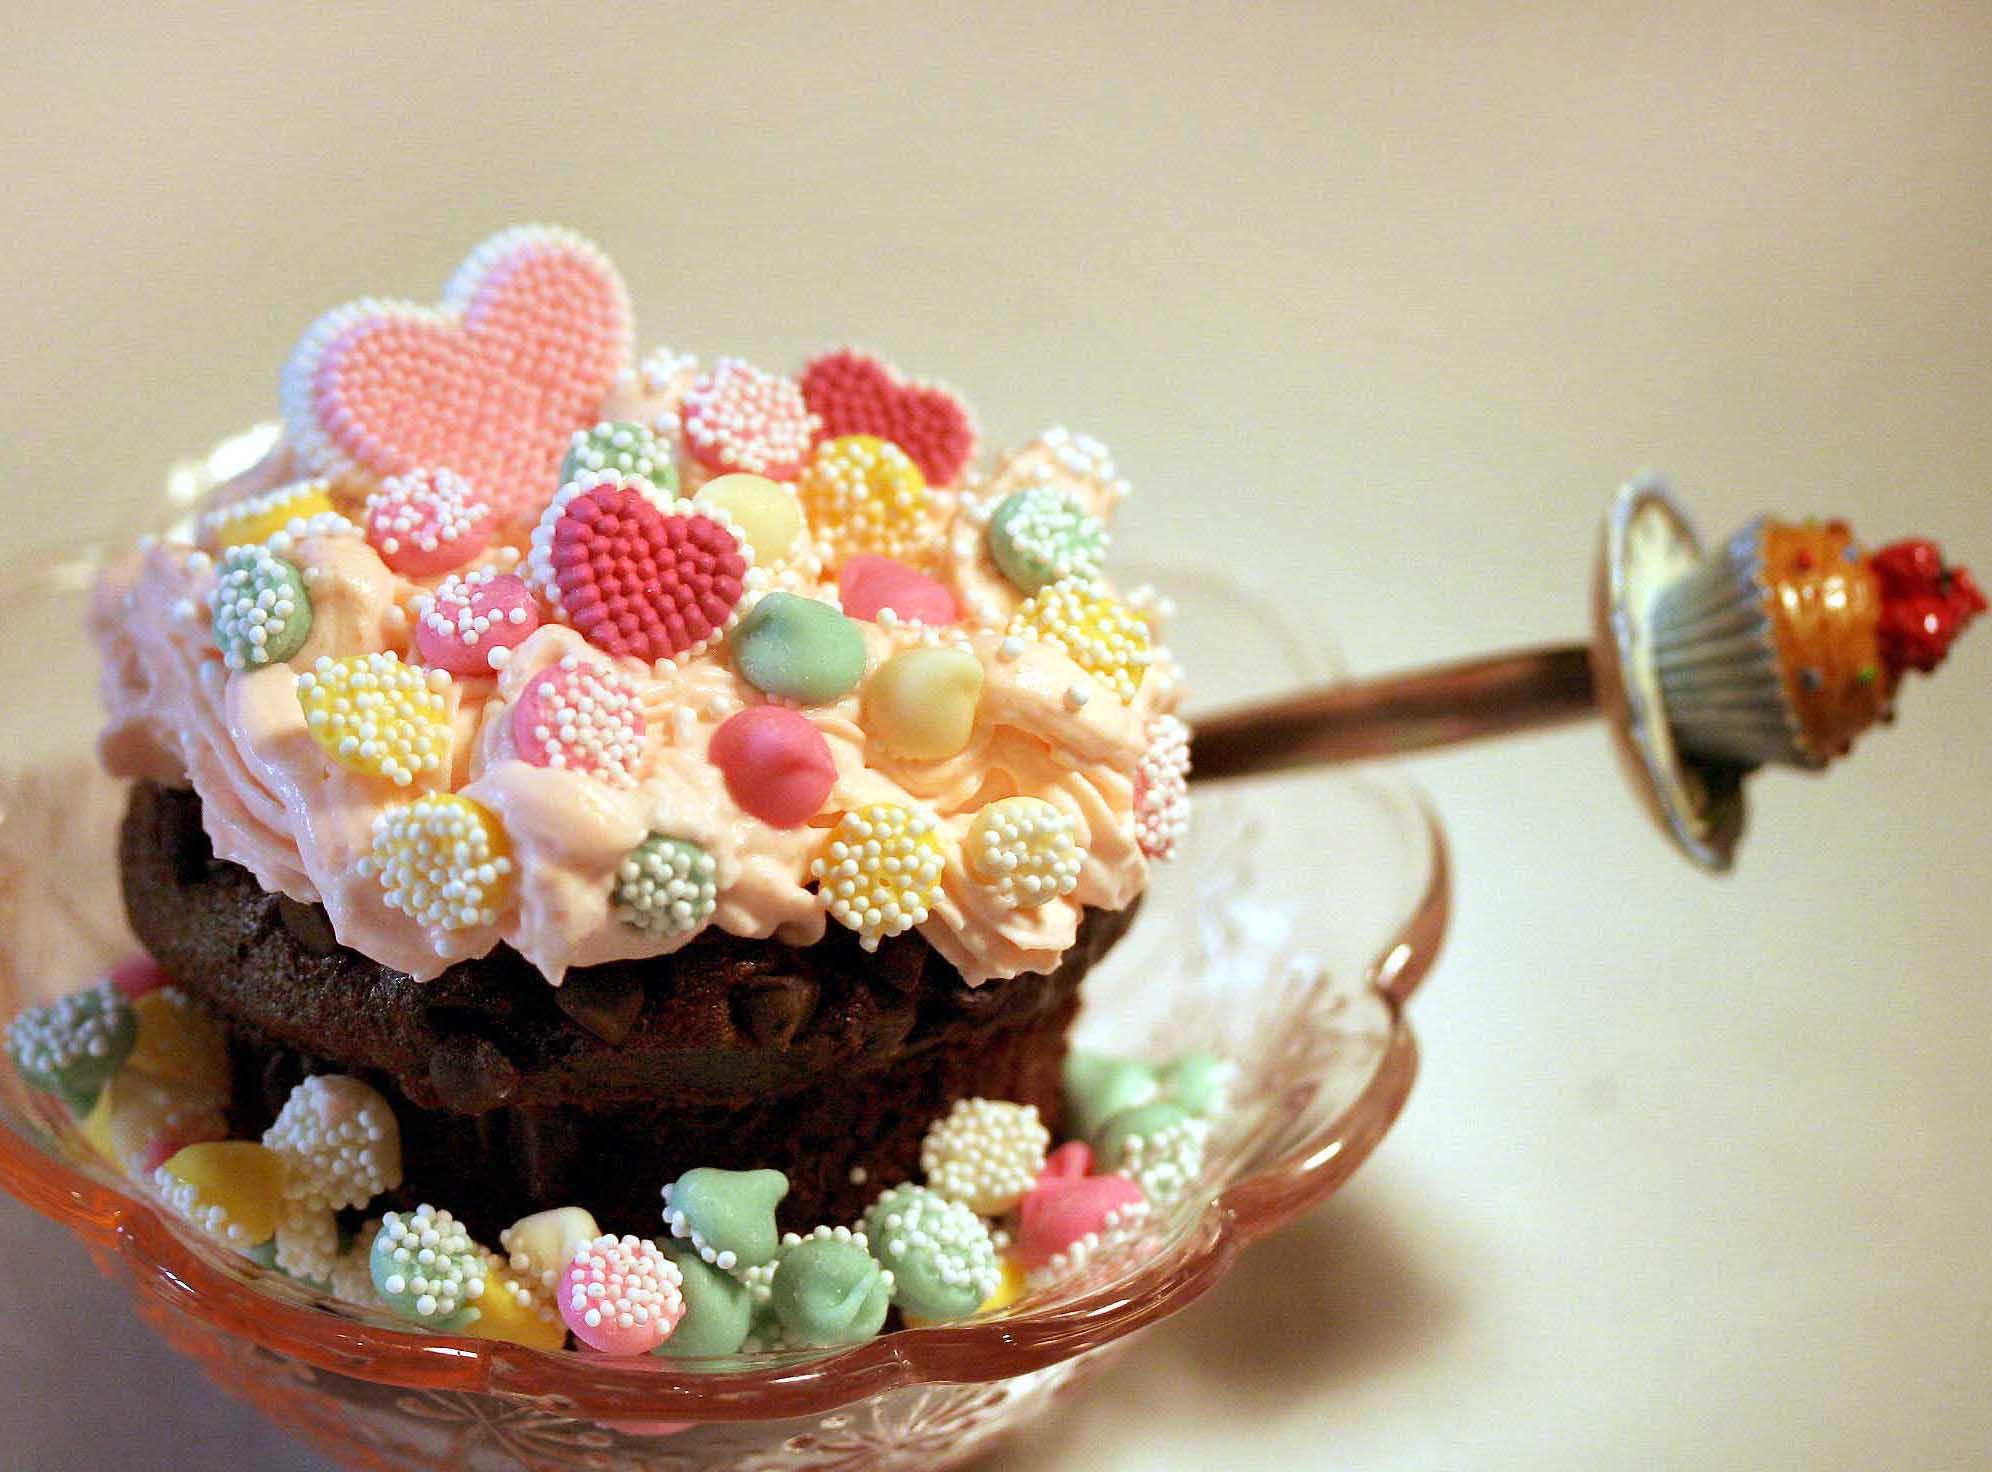 File:Cupcake2.jpg